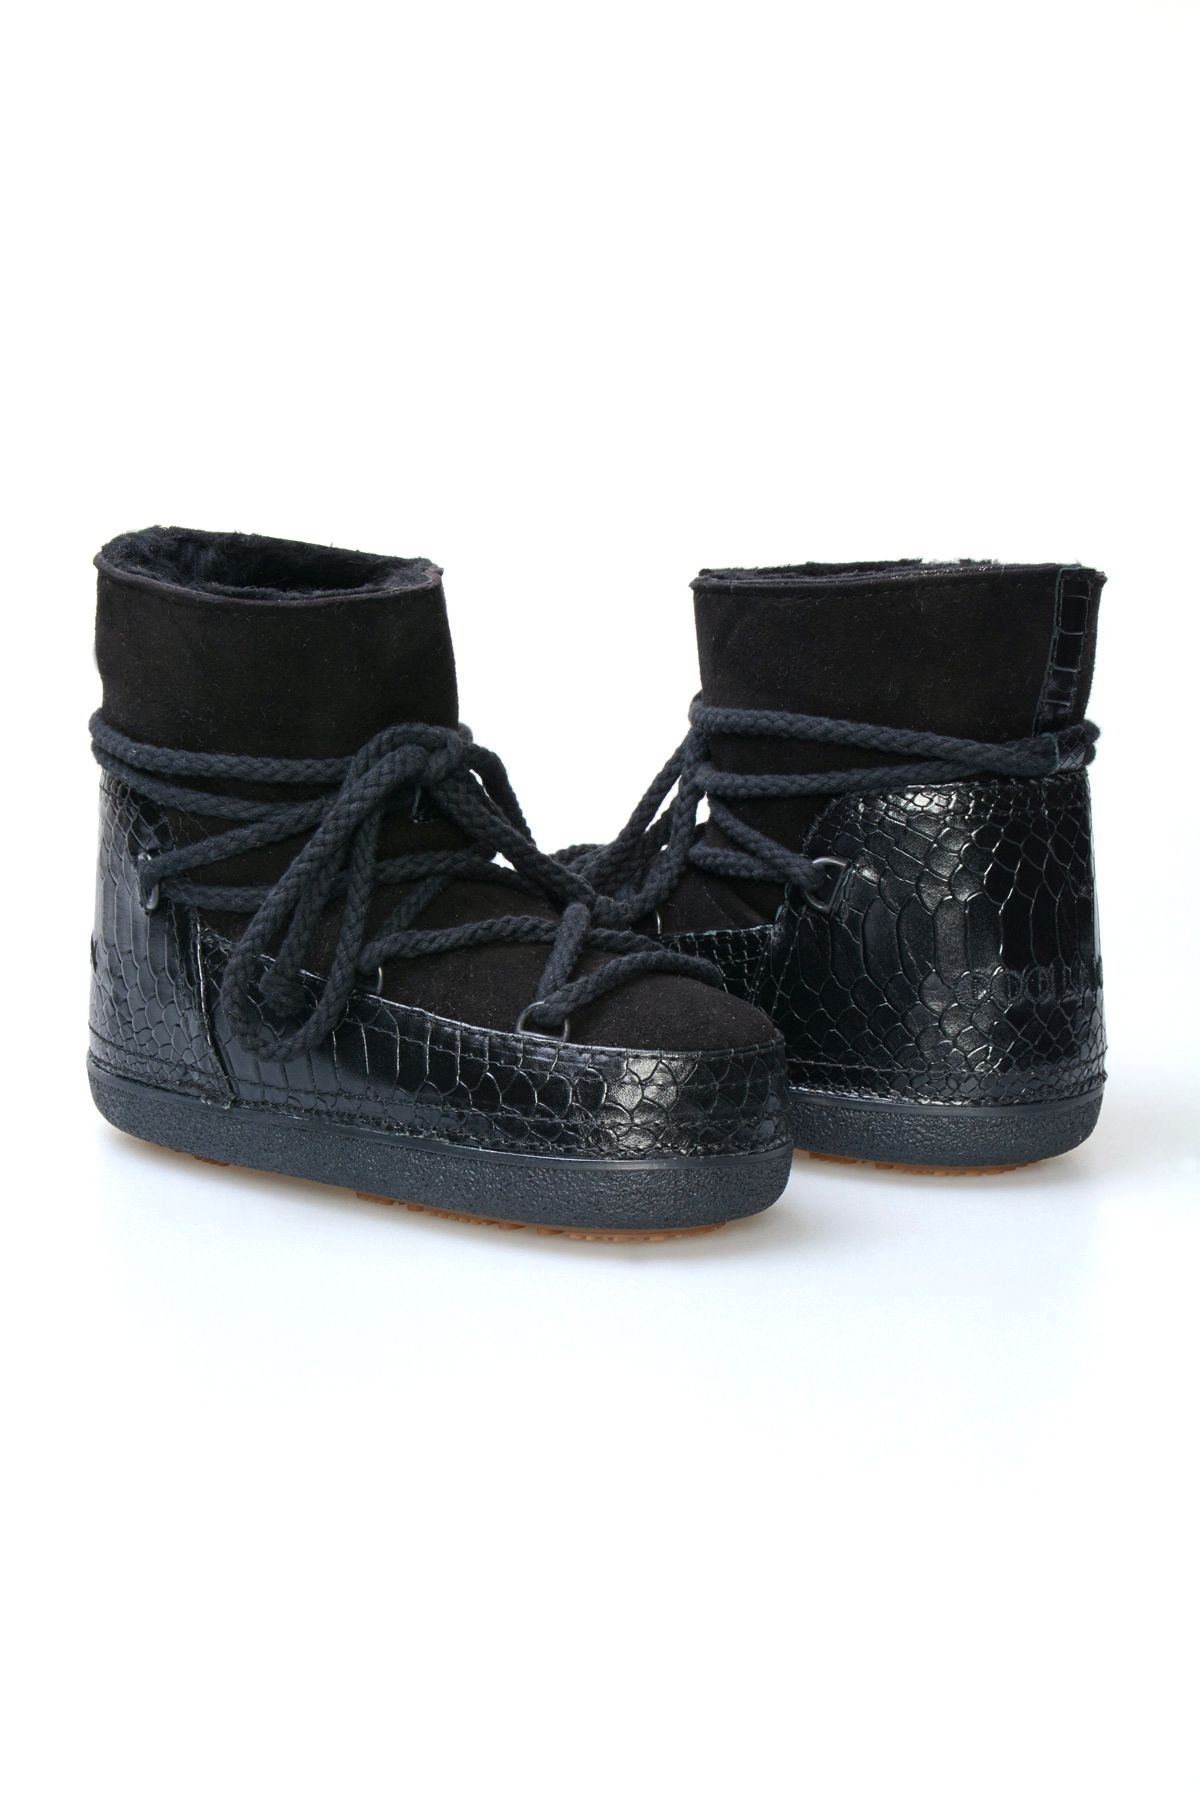 Cool Moon Genuine Sheepskin Women's Snow Boots 251010 Black